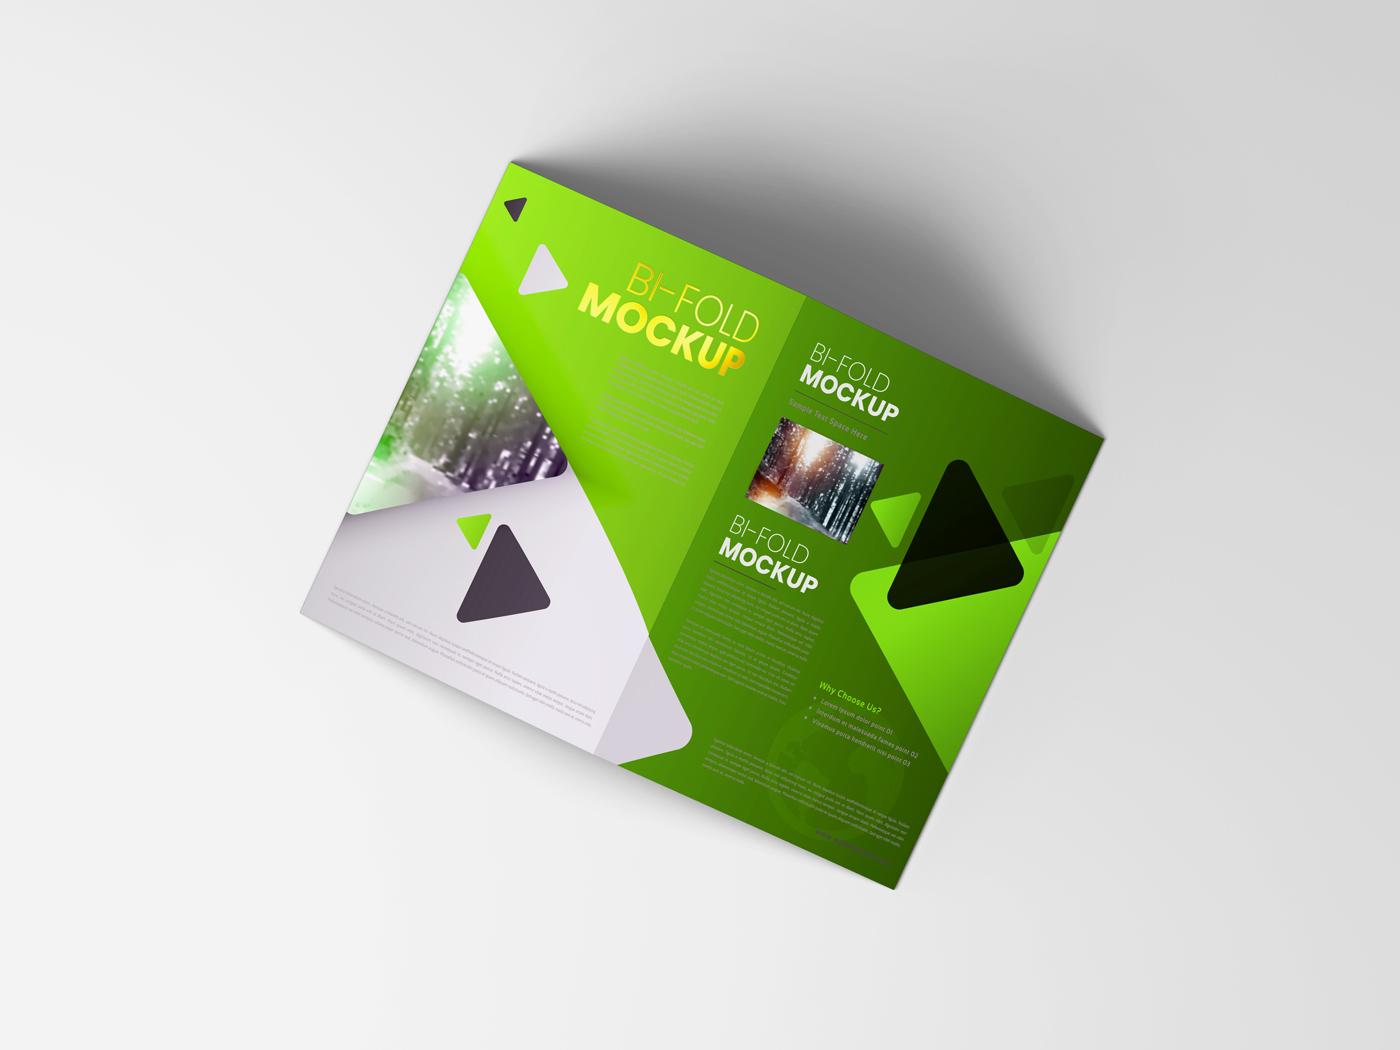 A4 Bifold Mockups V3 example image 16